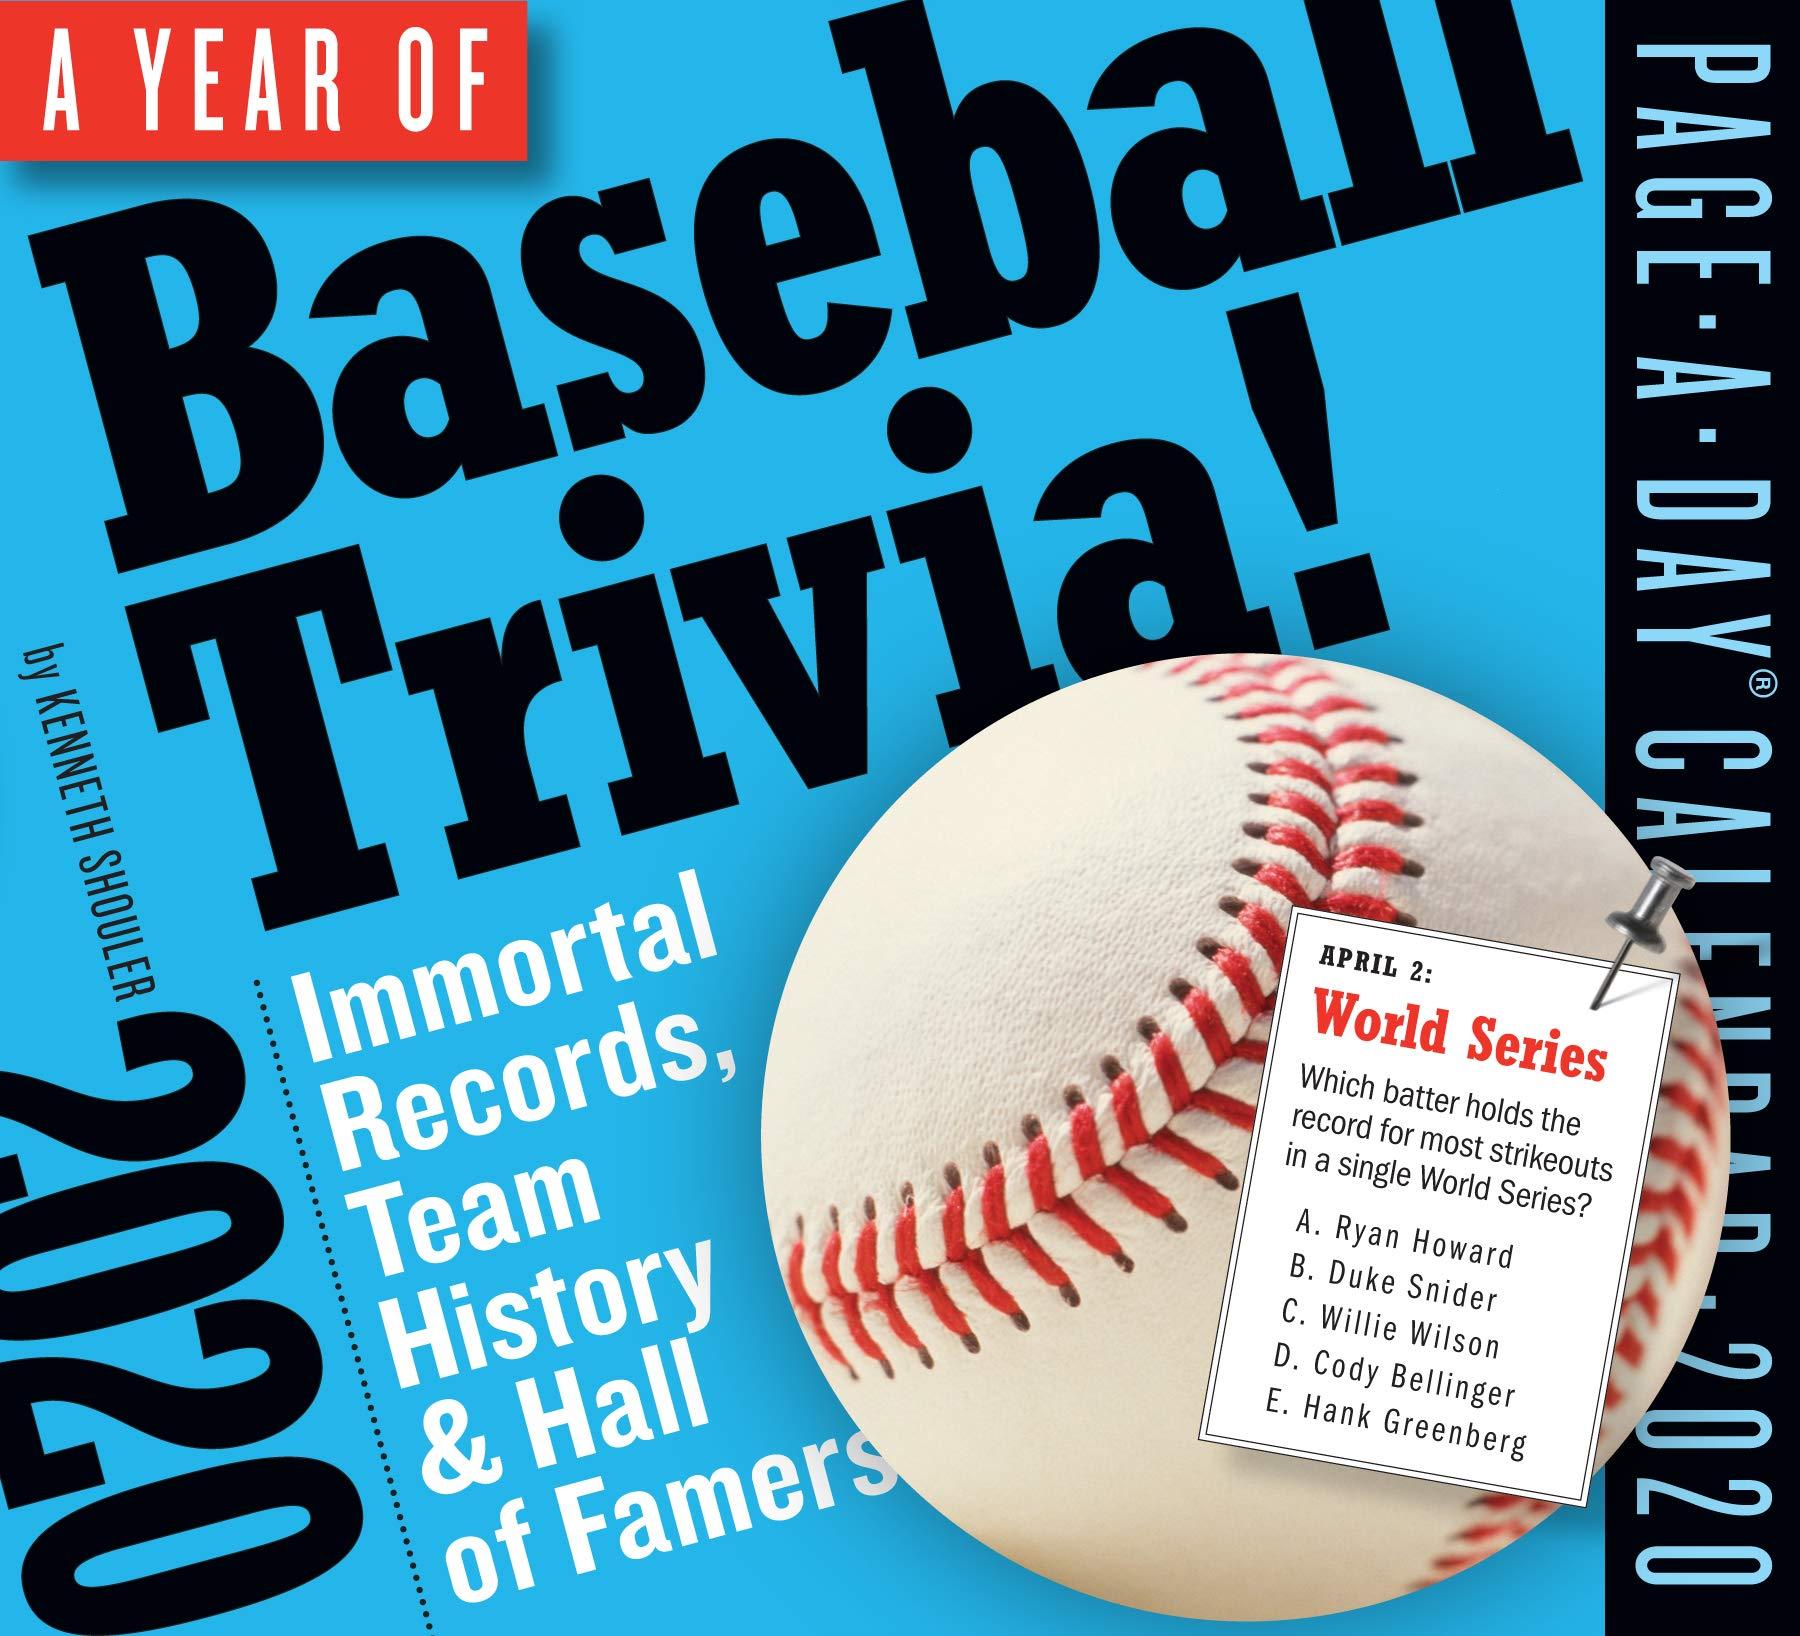 Baseball Calendar 2020 Year of Baseball Trivia! Page A Day Calendar 2020: Kenneth Shouler